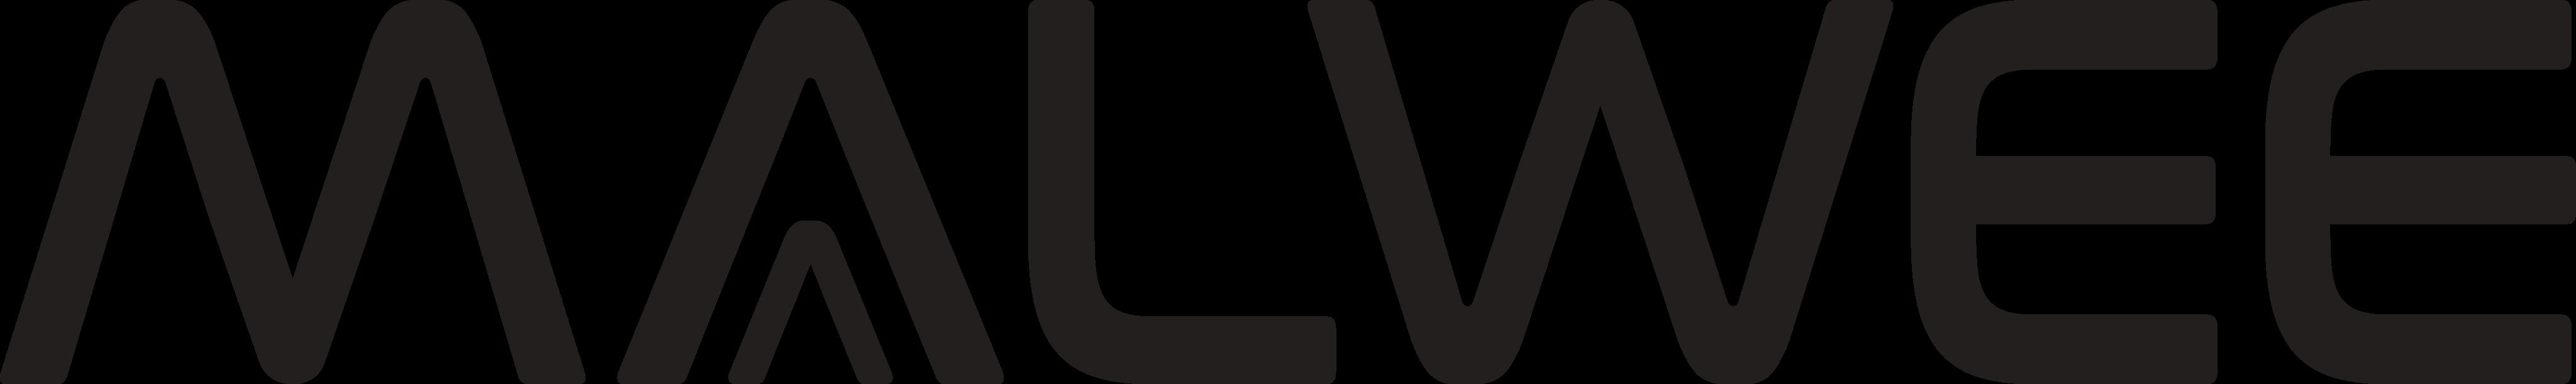 Malwee Logo.